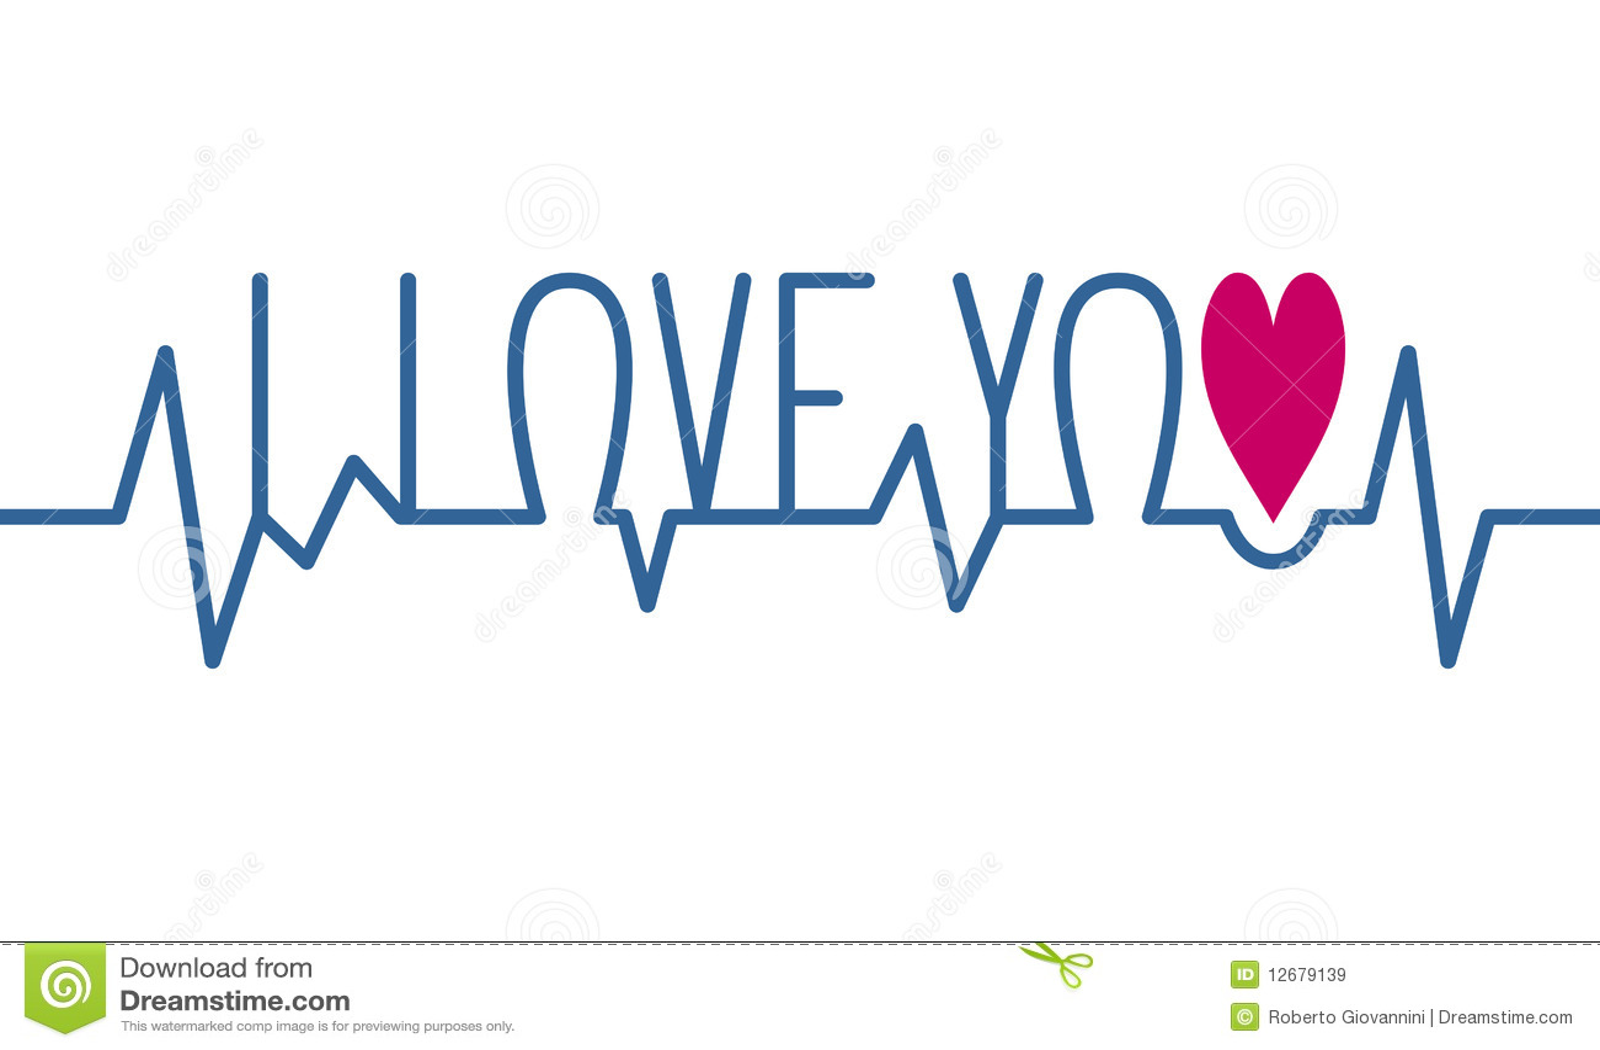 I Love You Imágenes De Stock I Love You Fotos De Stock: I Love You Heartbeat Royalty Free Stock Images